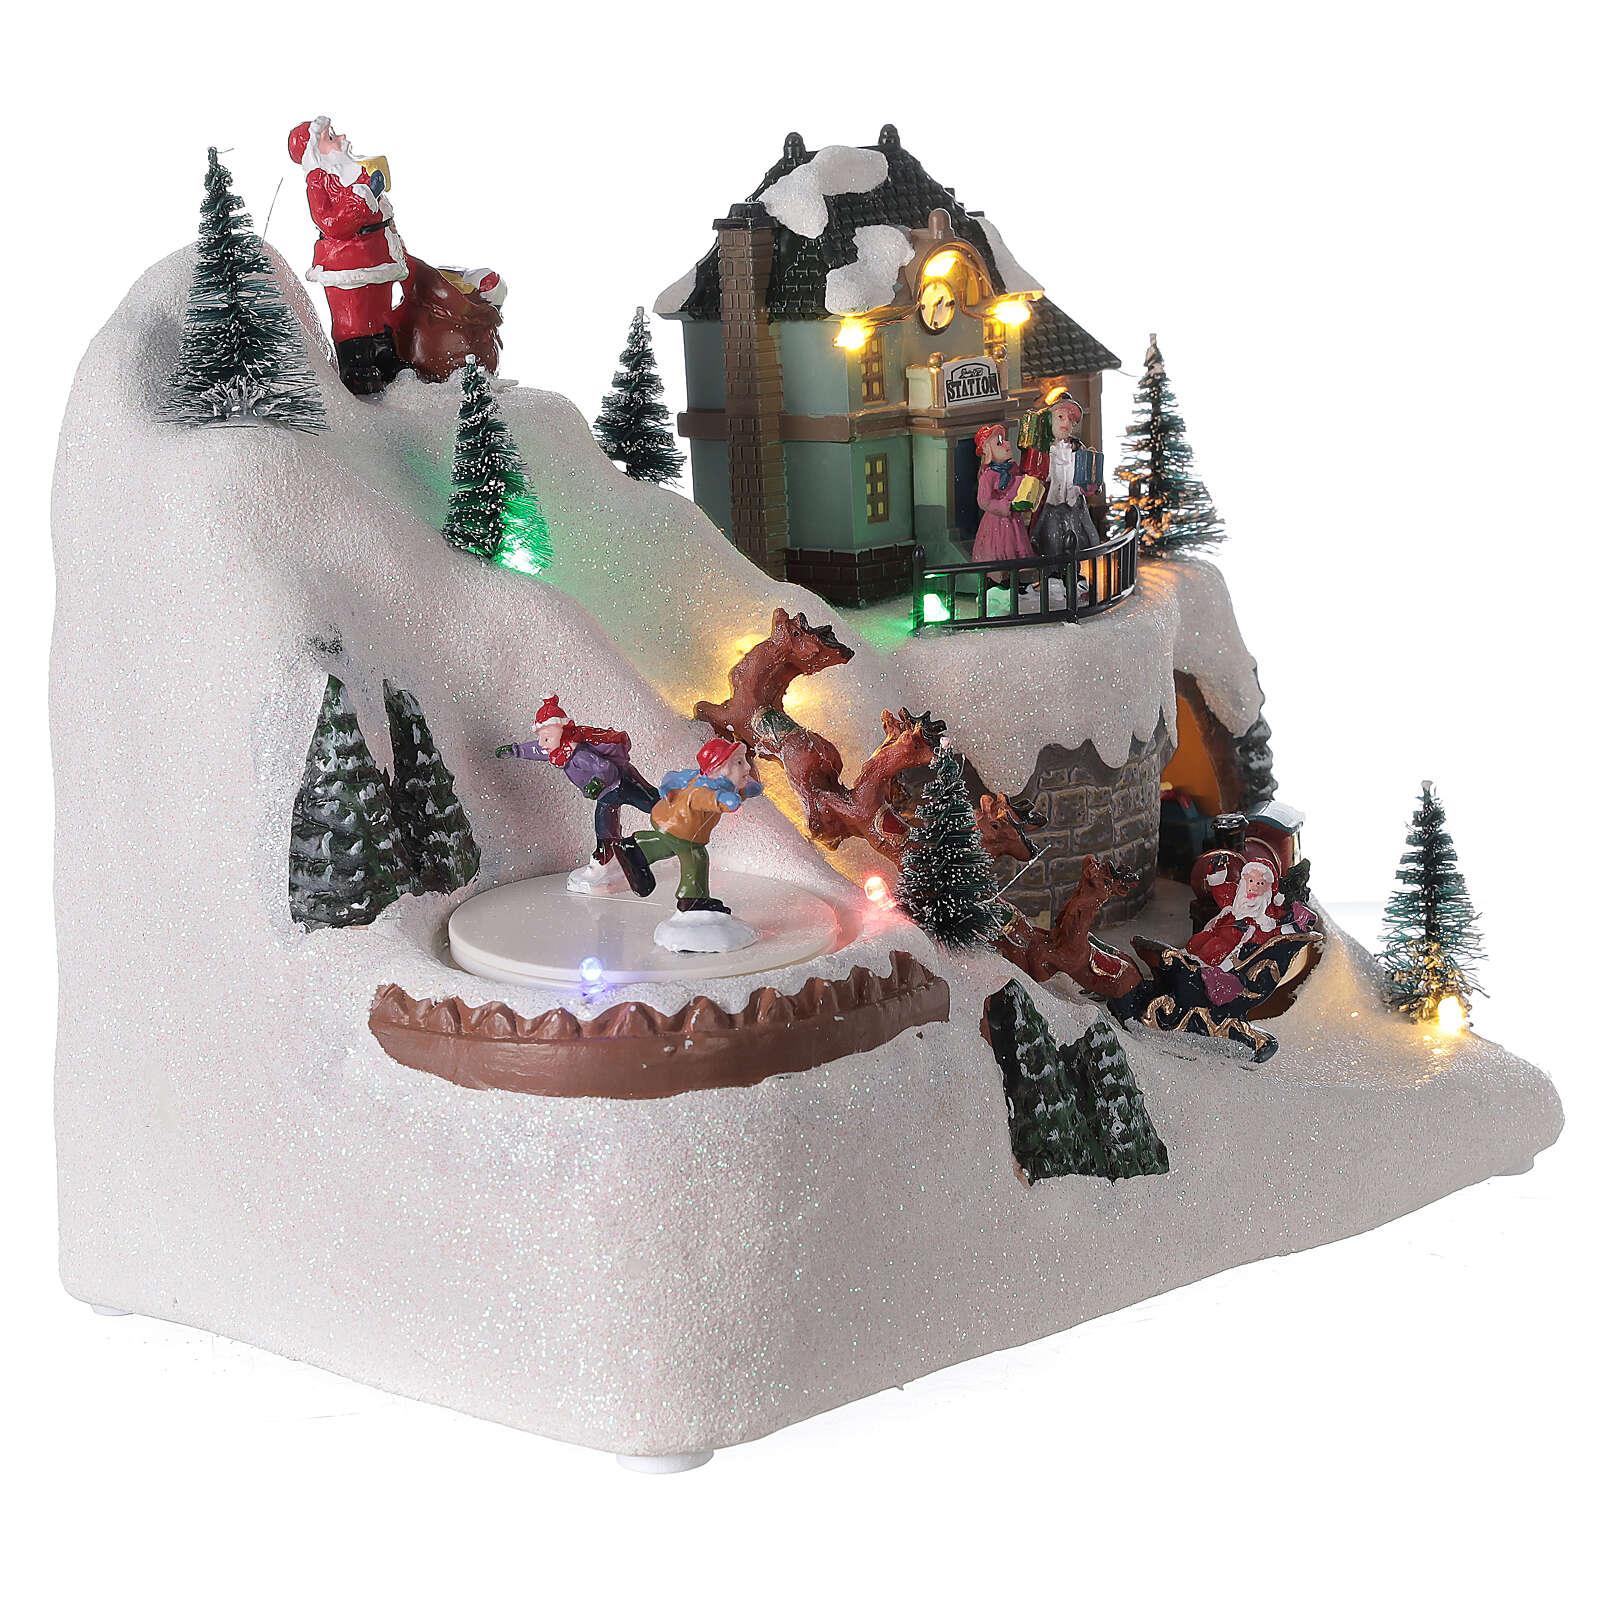 Christmas village reindeer sleigh Santa Claus LED lights music 20x25x15 cm 3